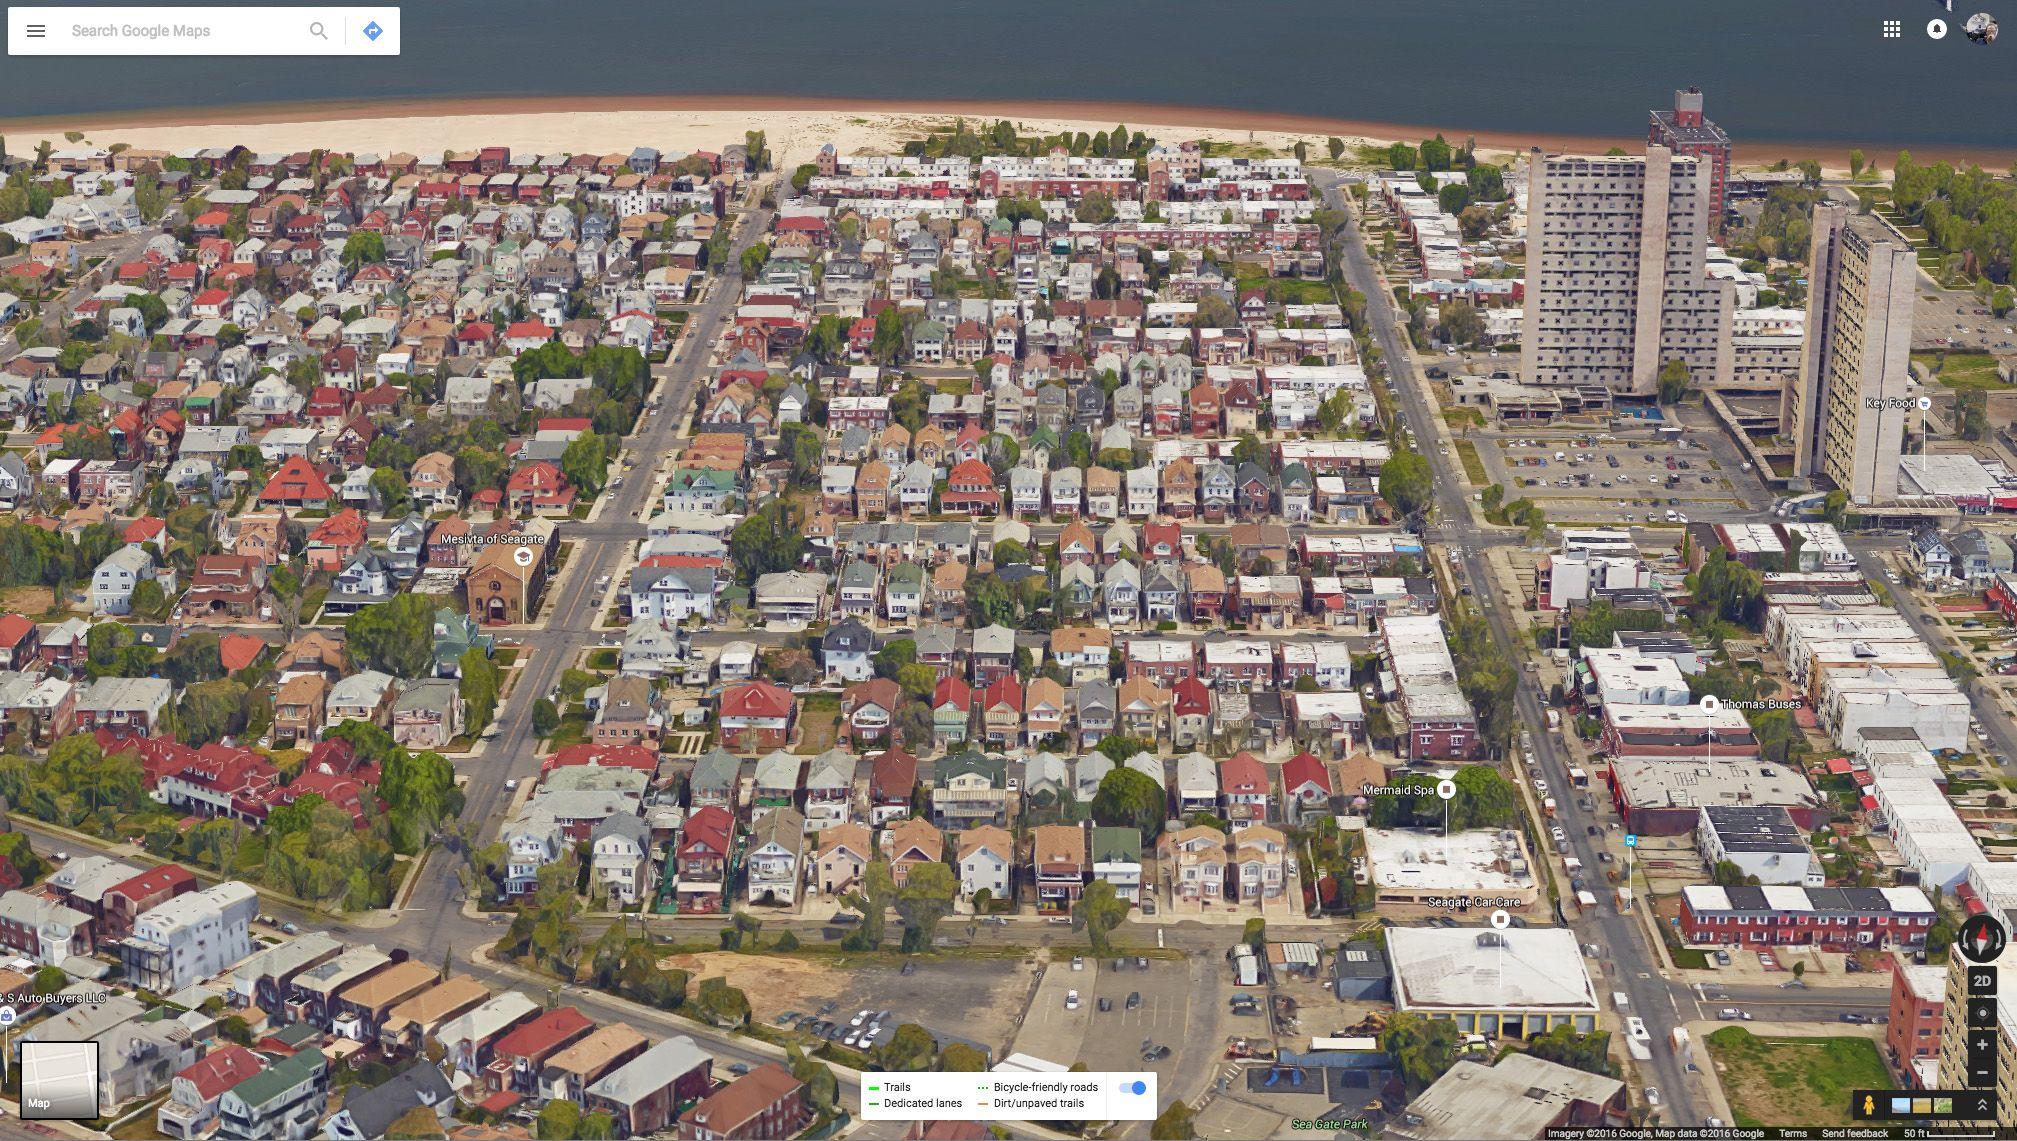 Seagate, Brooklyn. | Gated community, City photo, Aerial